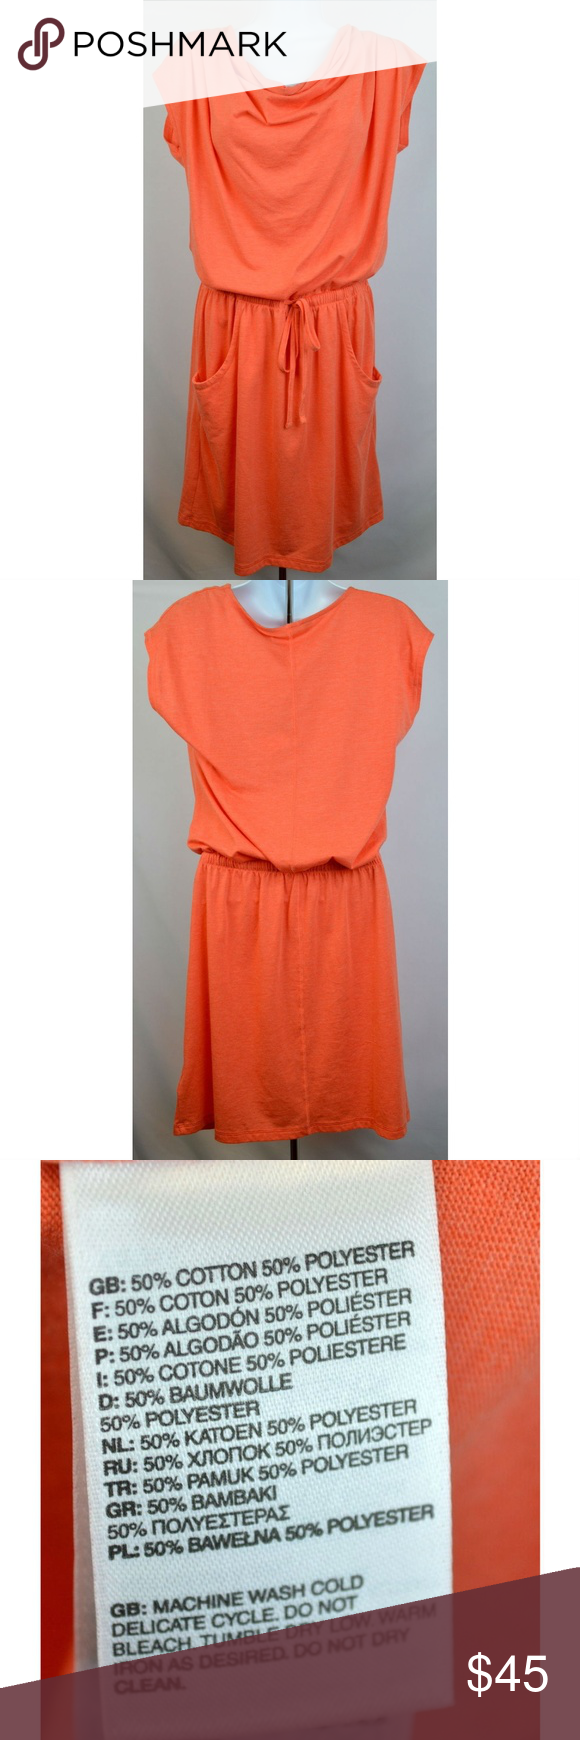 Womens Aurora Casual Dress Coral Orange Pink Red Casual Dress Clothes Design Clothes For Women [ 1740 x 580 Pixel ]